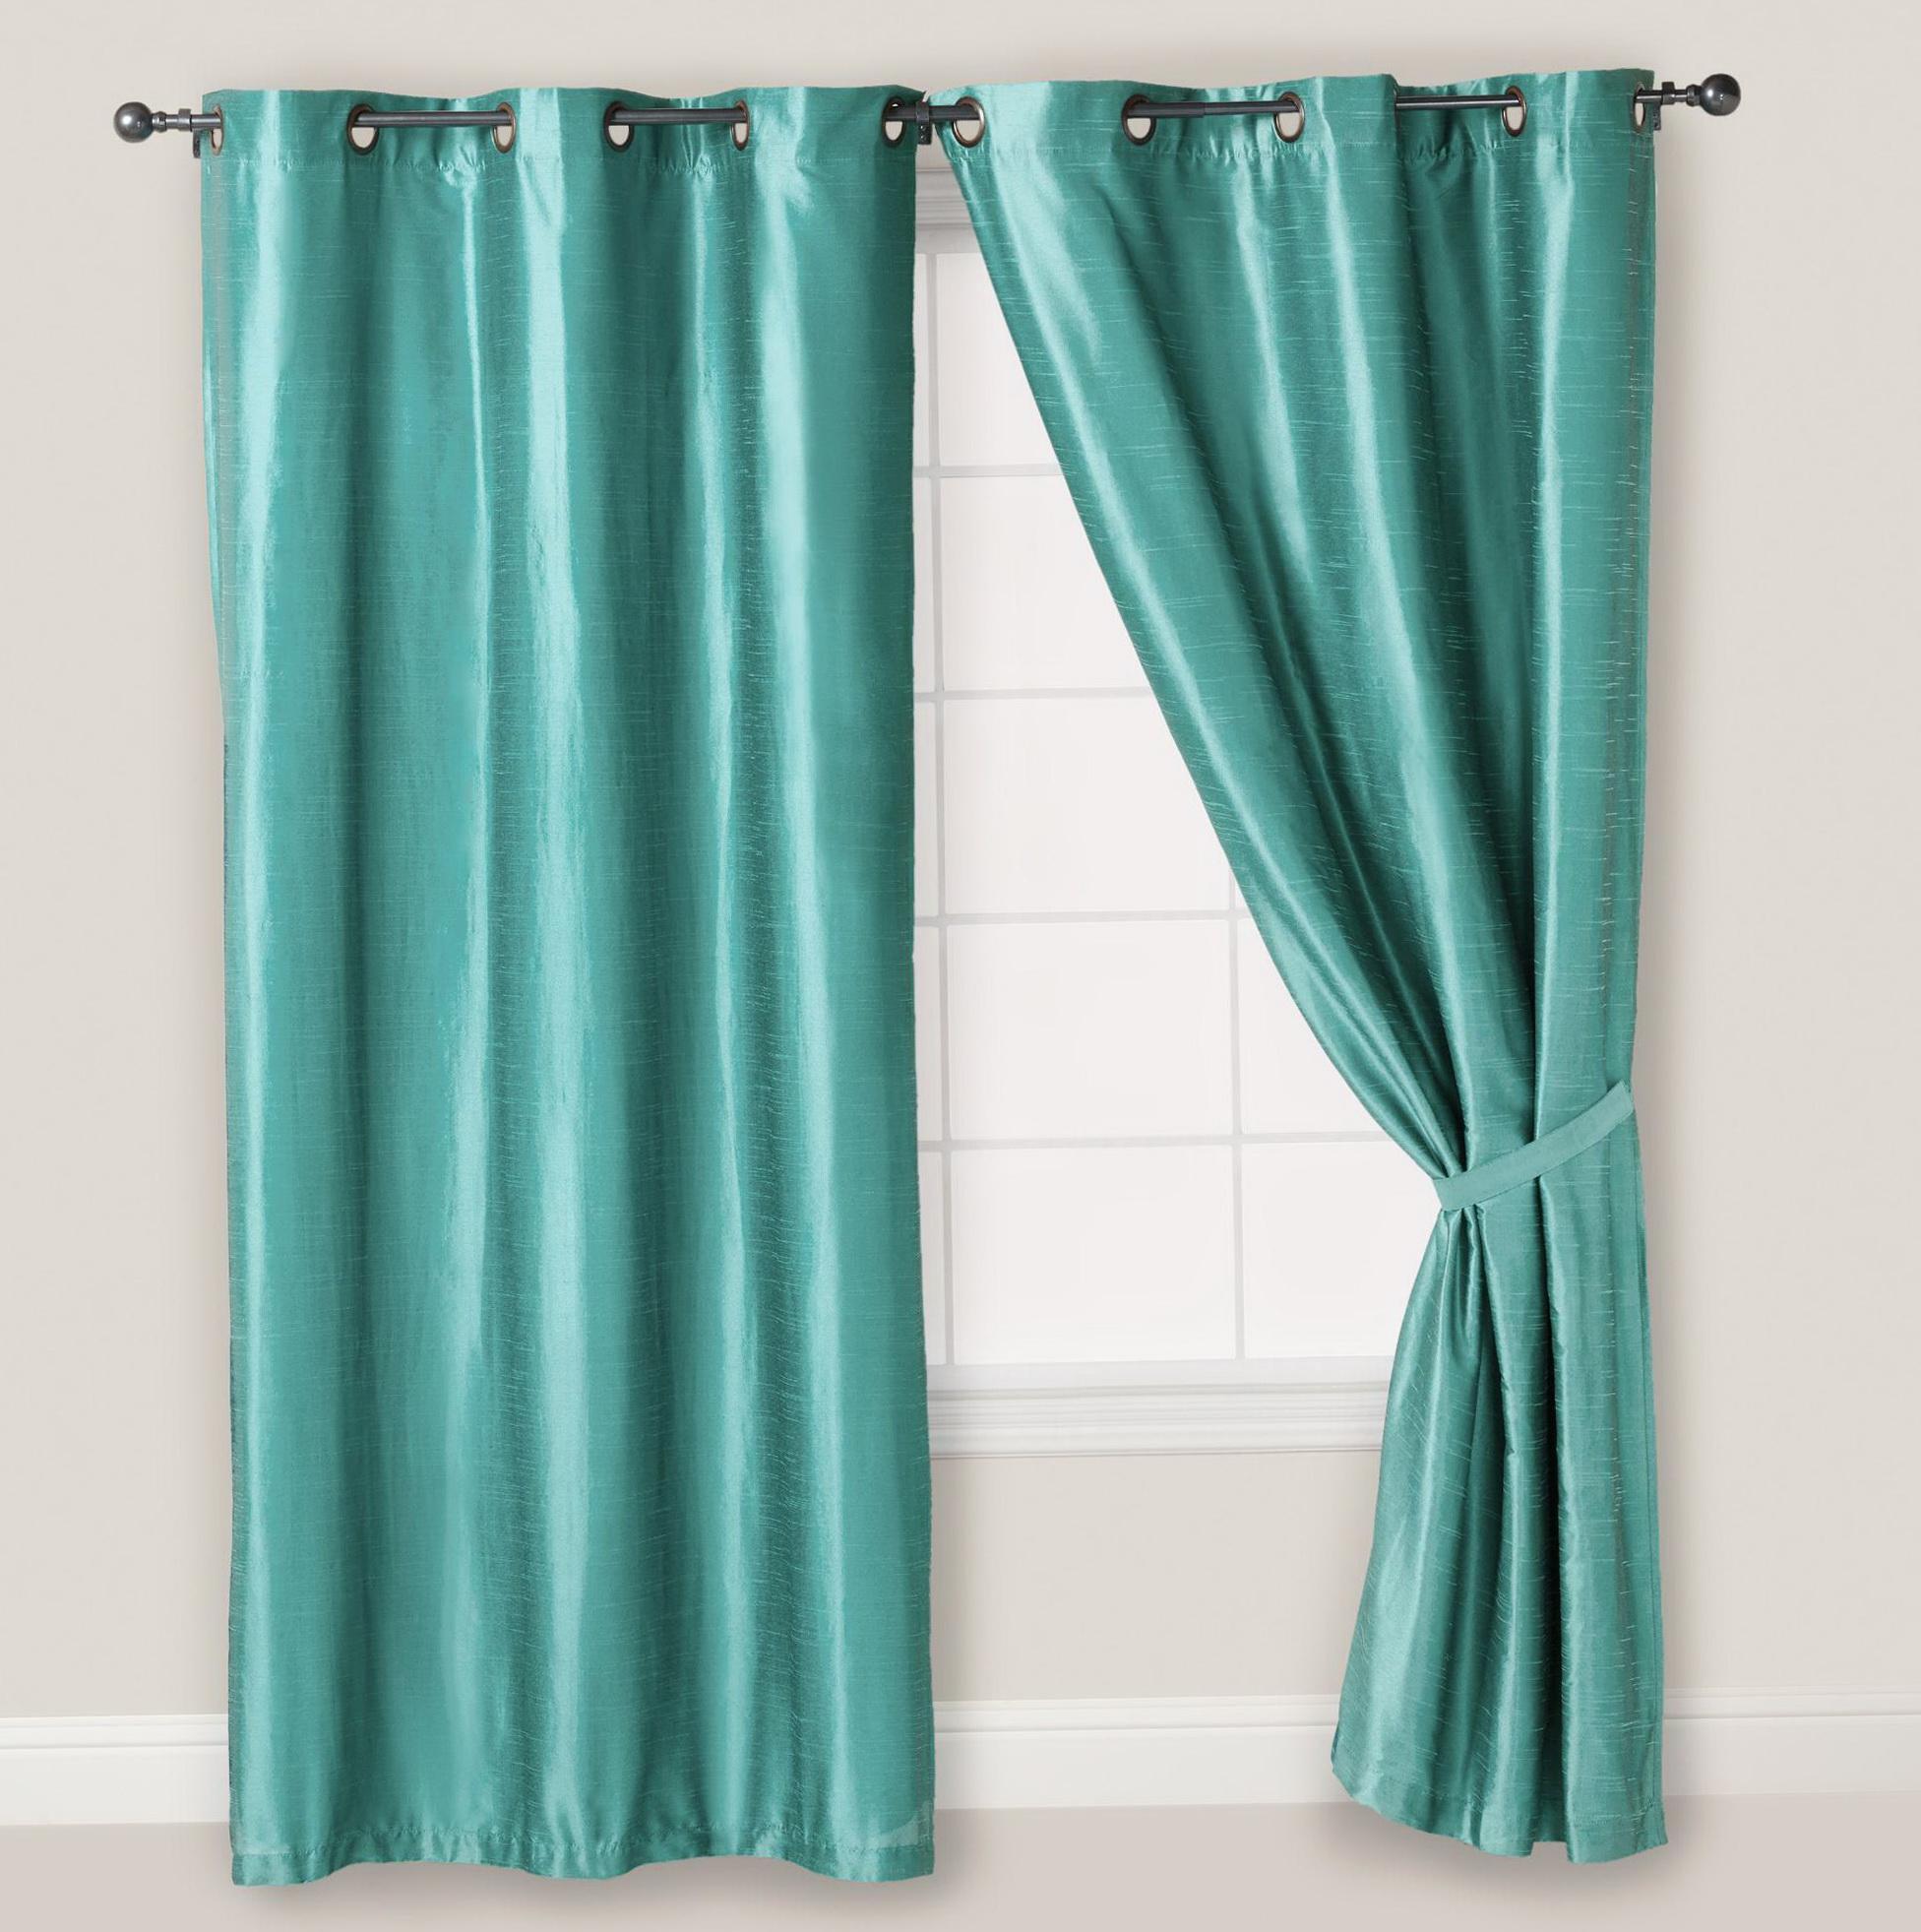 Teal Blue Curtain Panels Home Design Ideas